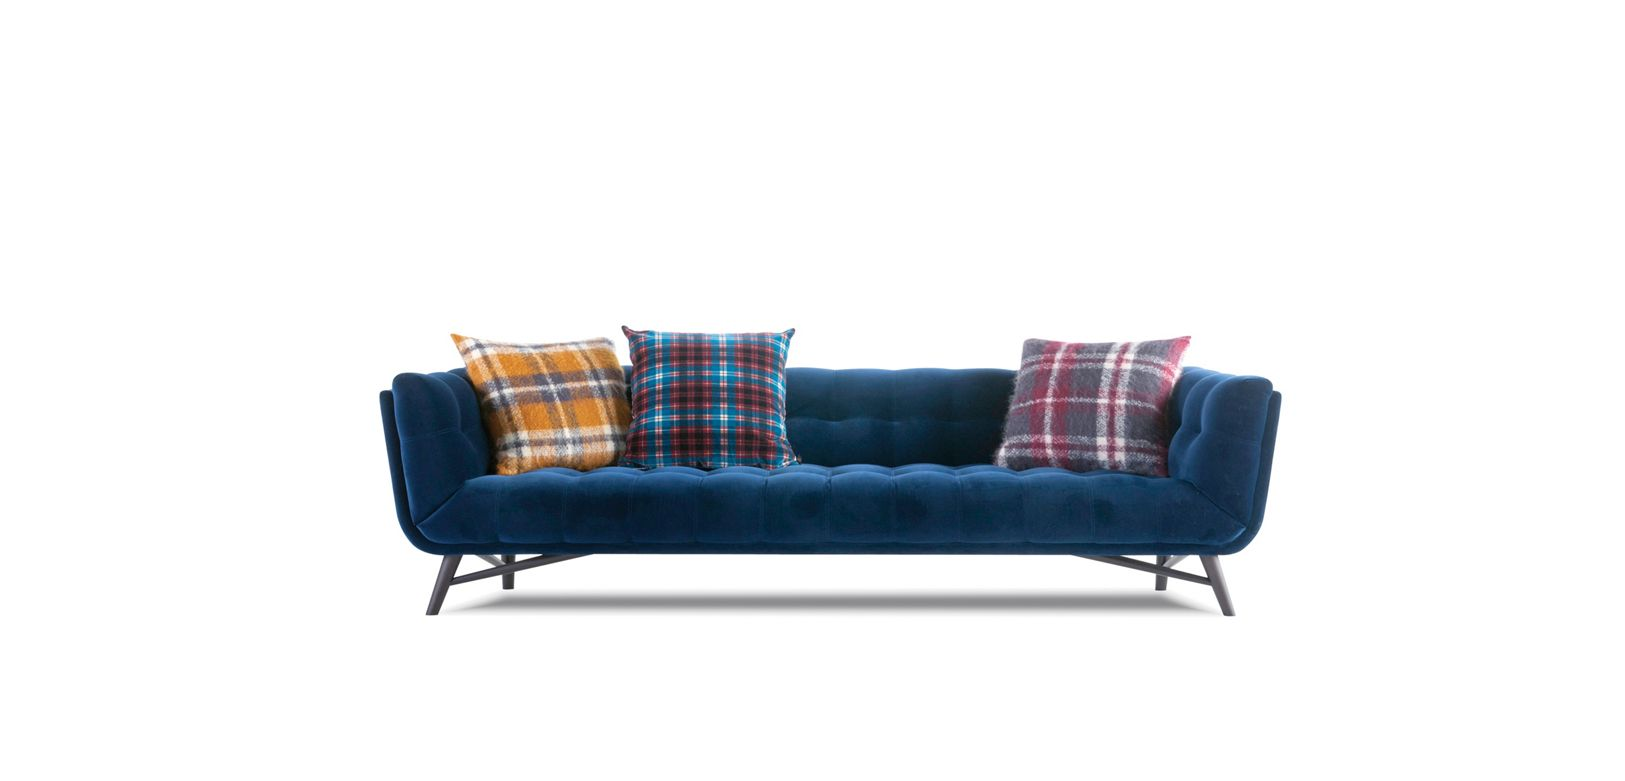 Amazing Profile Sofa Sofas Sofa Beds Roche Bobois Creativecarmelina Interior Chair Design Creativecarmelinacom